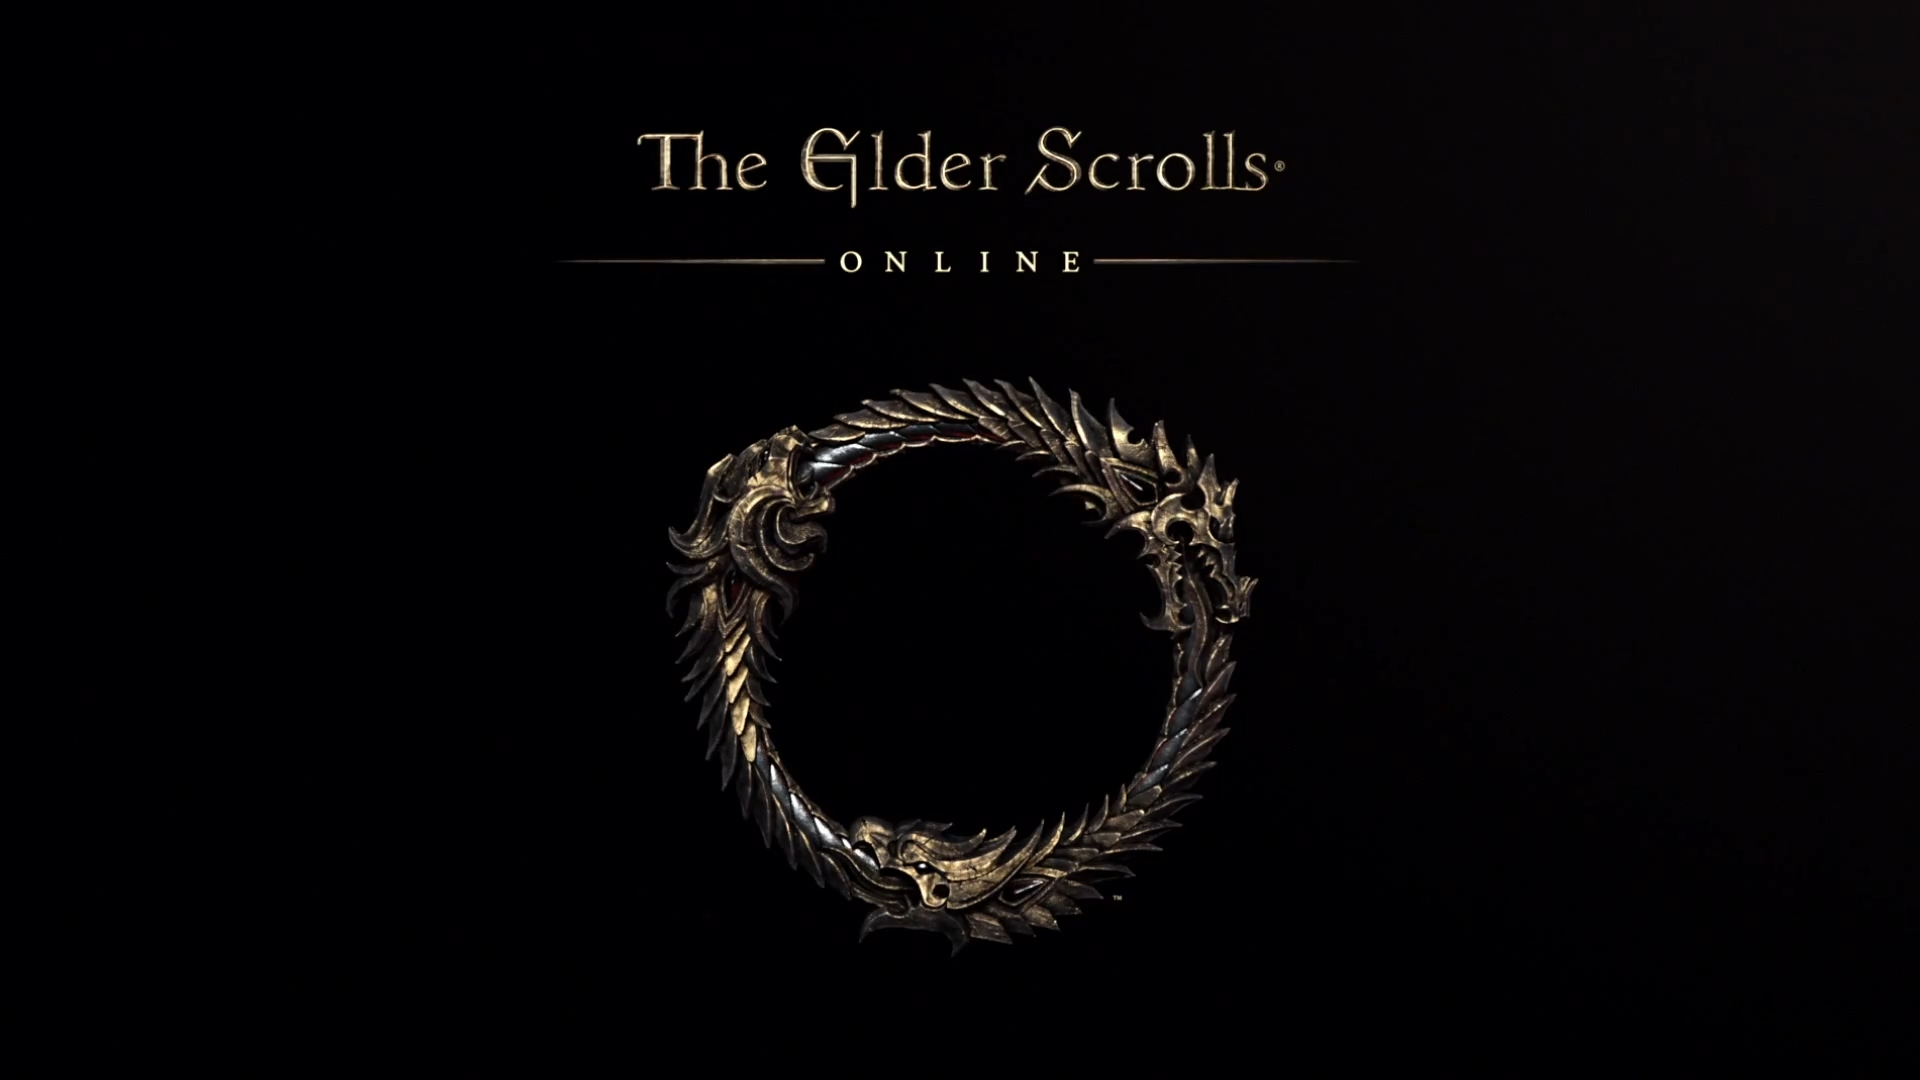 The Elder Scrolls Online wallpaper 4